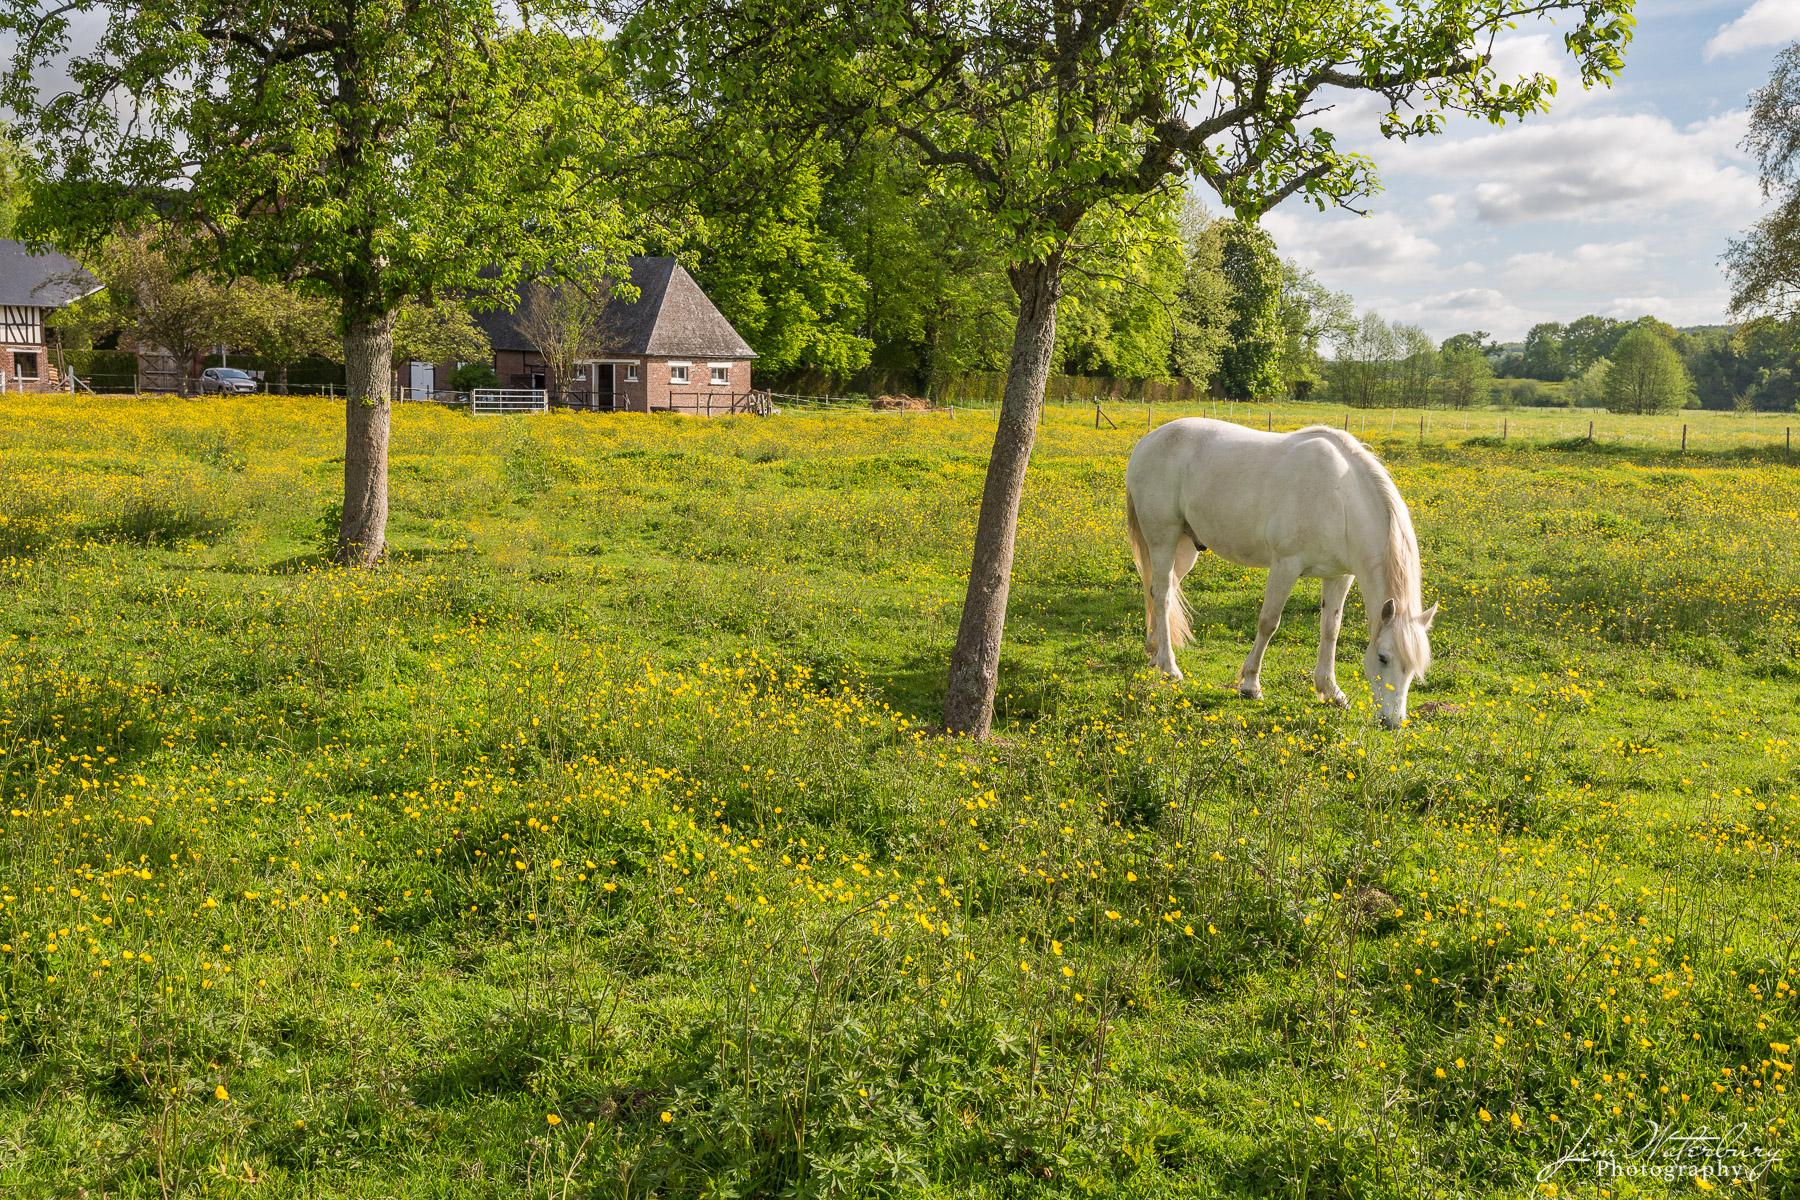 Horses at pasture outside Chateau de Vastoeuil, Normandy, France